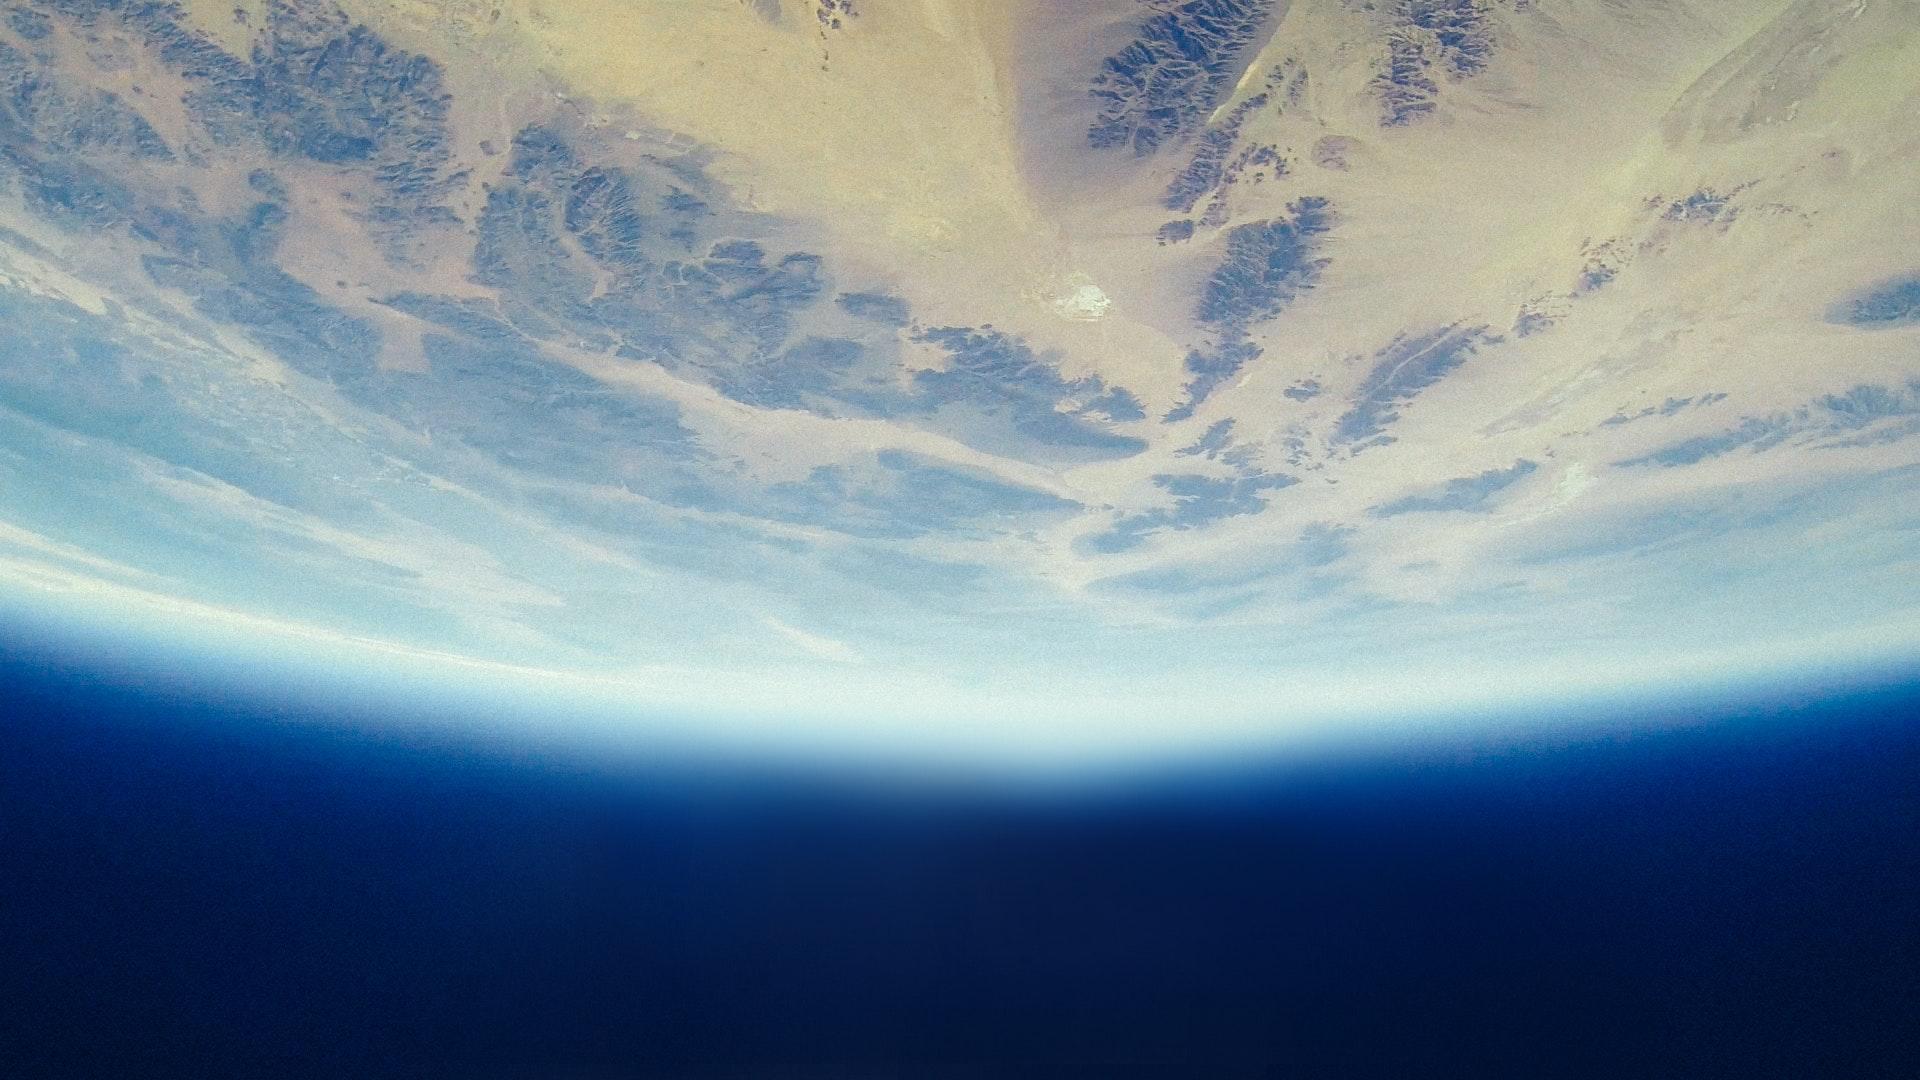 solar geoengineering image